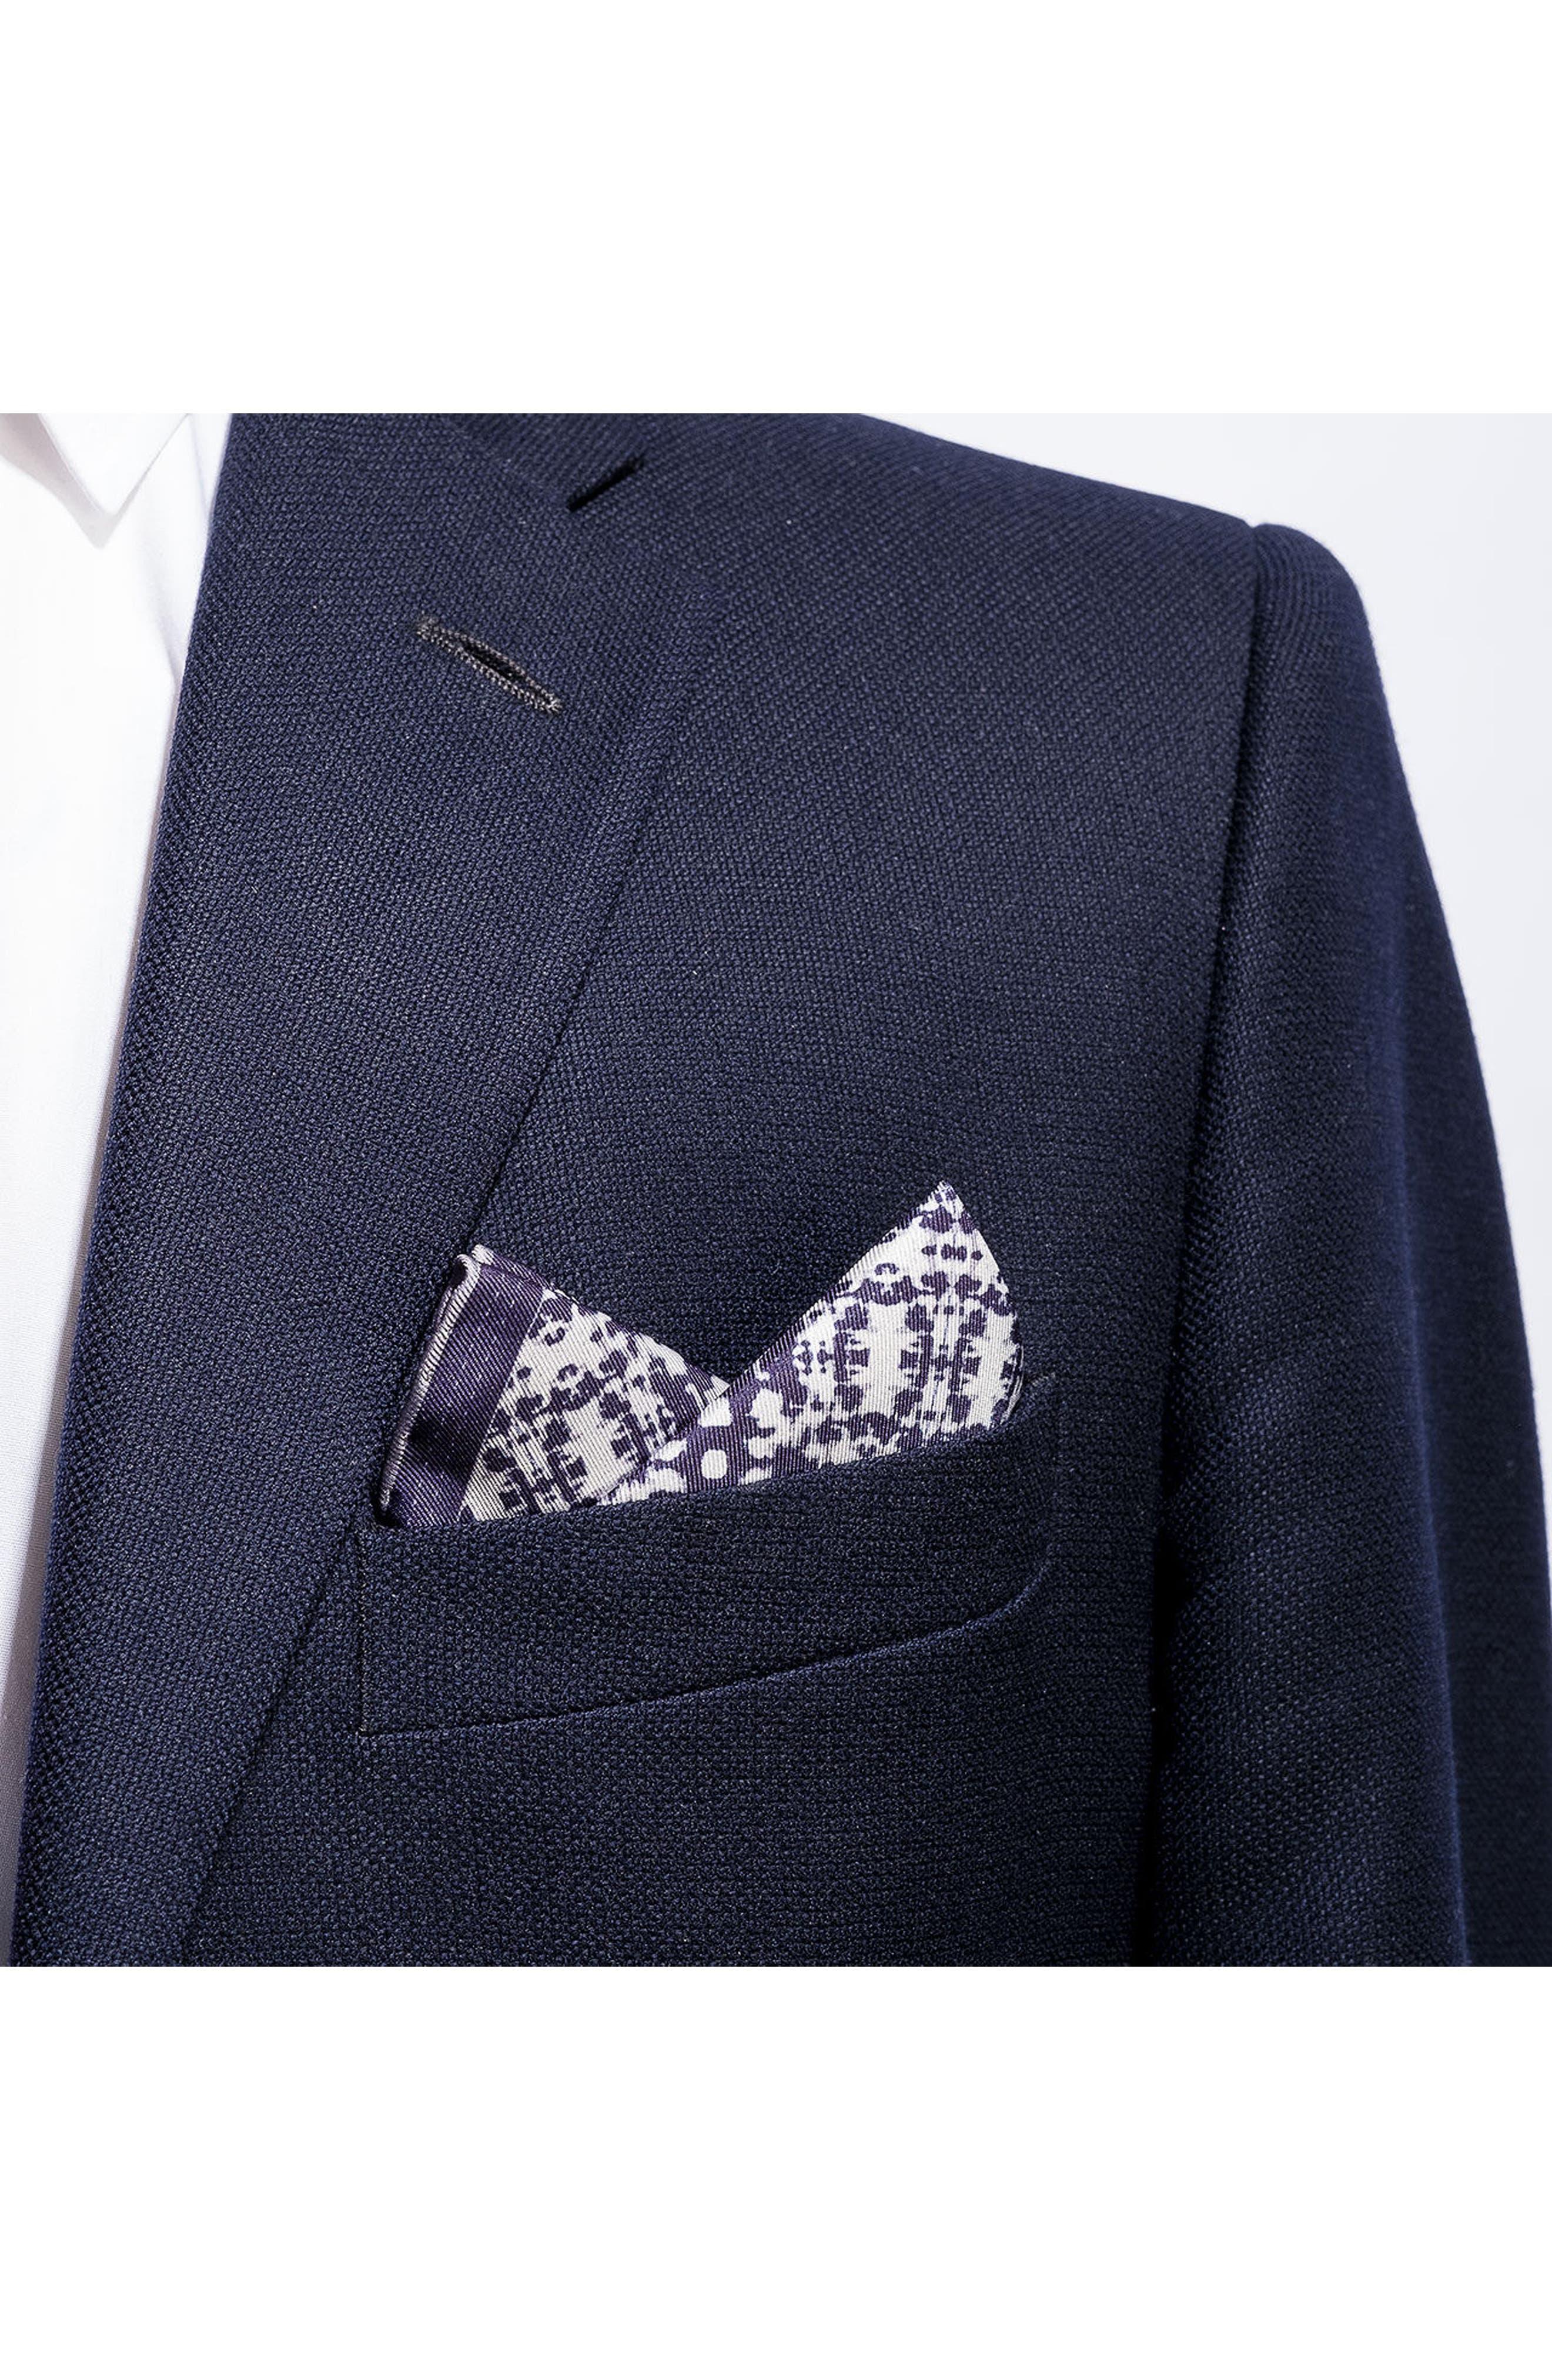 Alternate Image 3  - hook + ALBERT Batik Patterned Silk Pocket Square